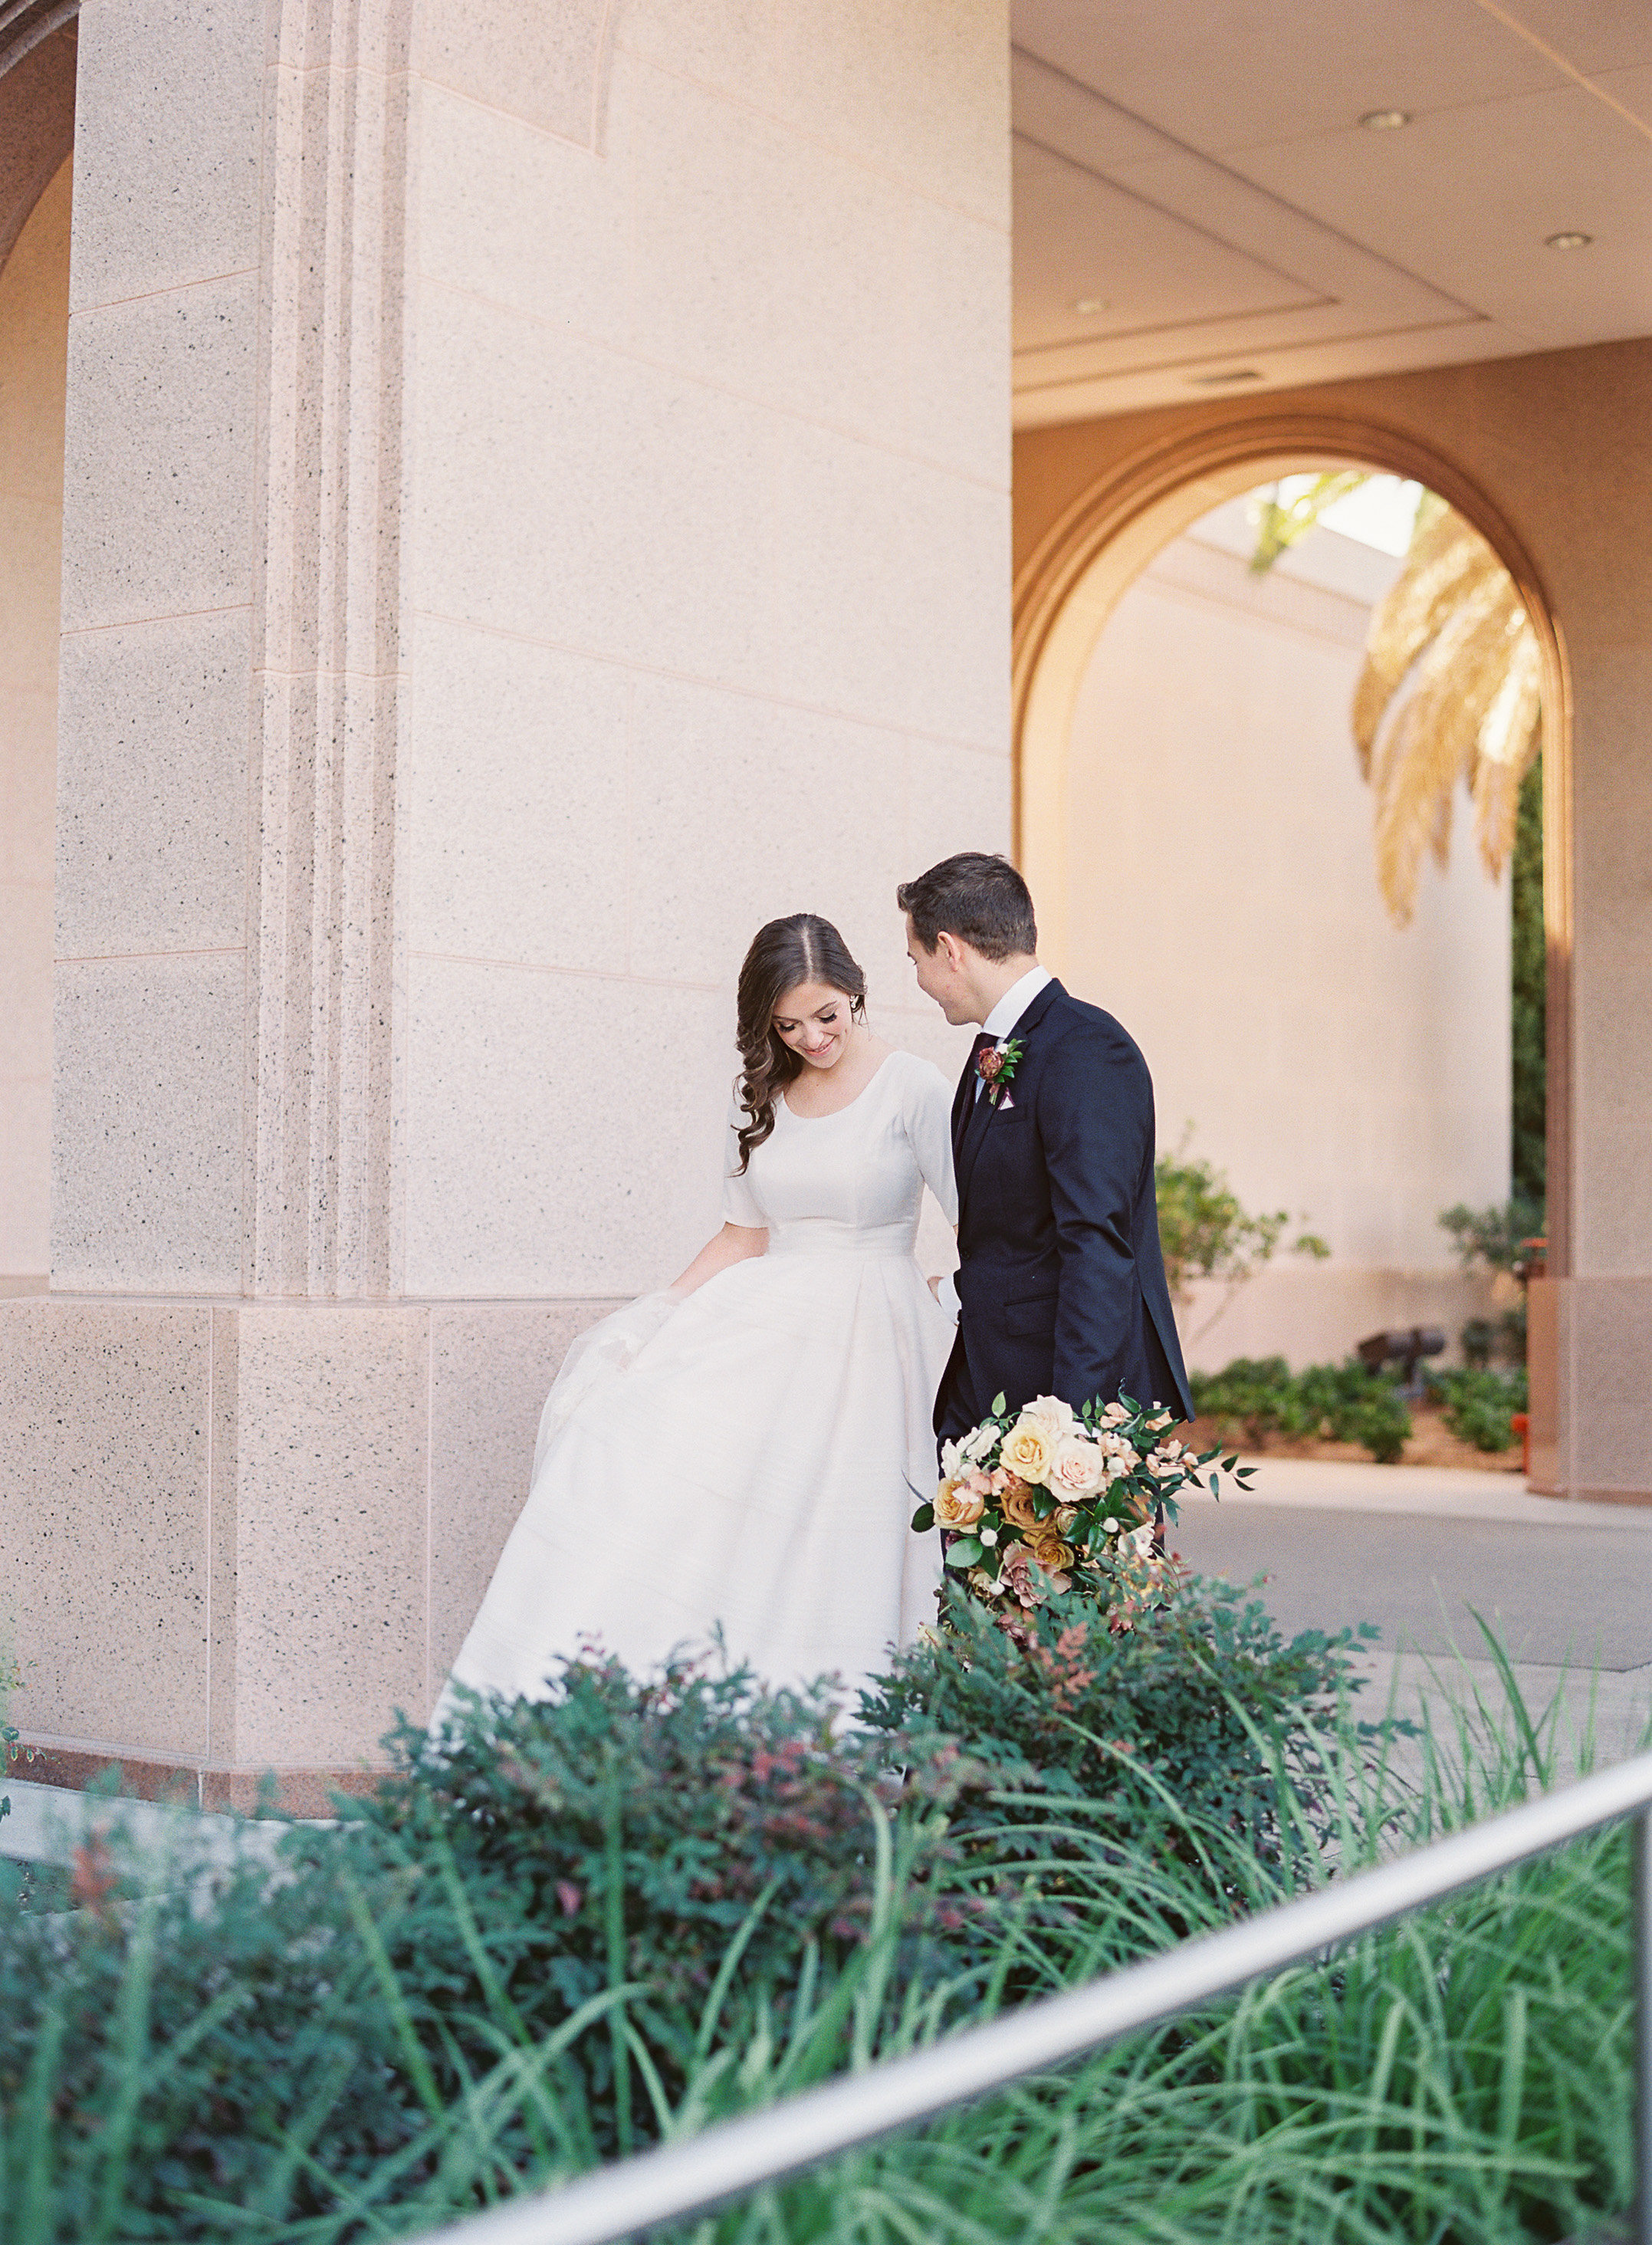 brooke dalton wedding couple